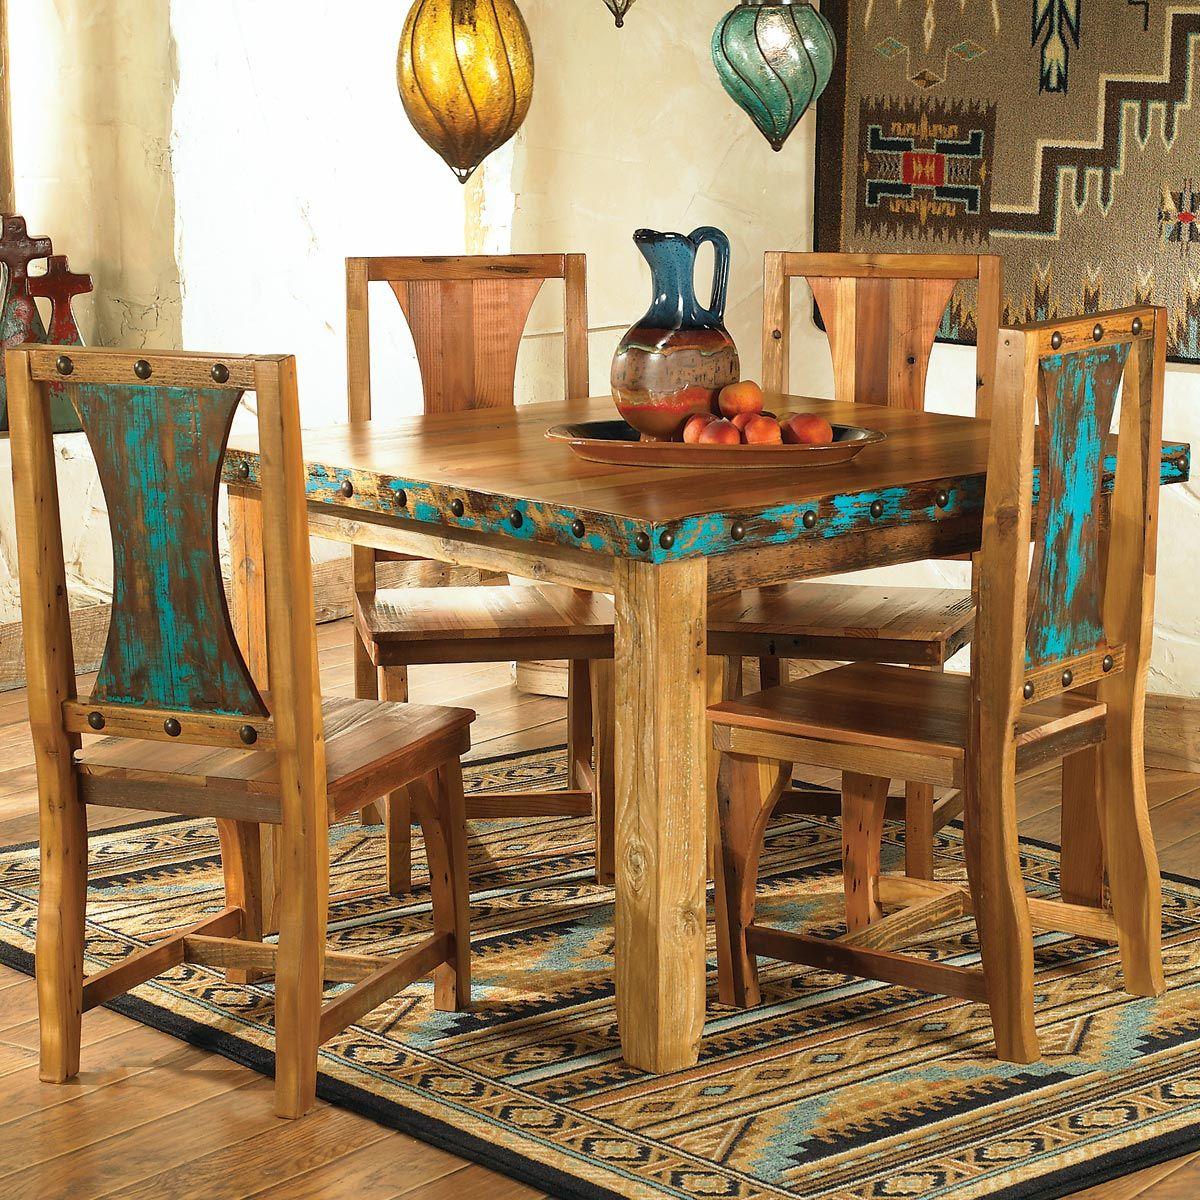 Rustic Home Decorating Design Ideas Log Home Ideas Western Home Decor Rustic Dining Room Home Decor #western #living #room #sets